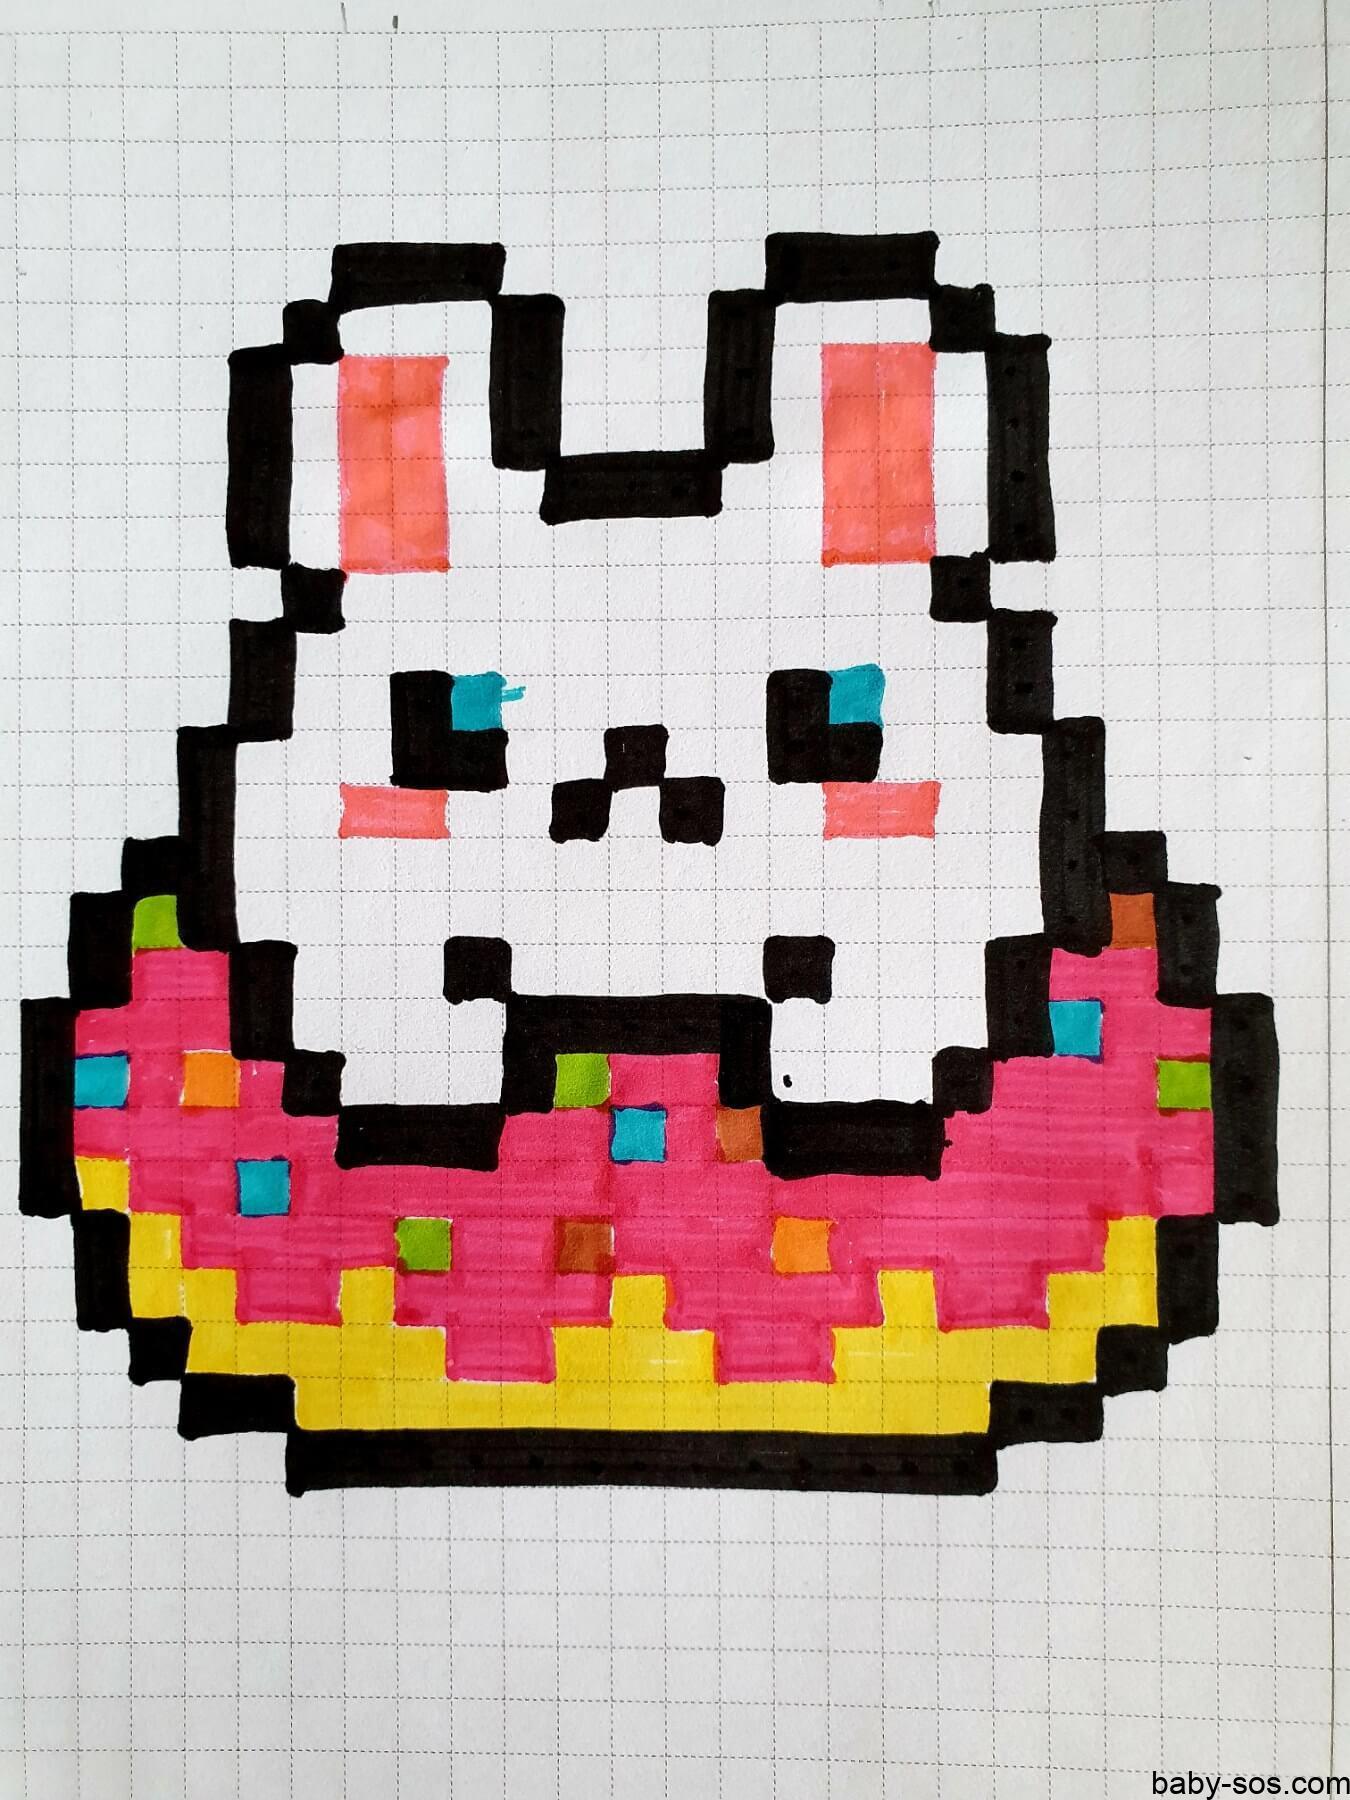 hamster in donut, drawings on cells, drawings by cells, pixel art, pixel drawings